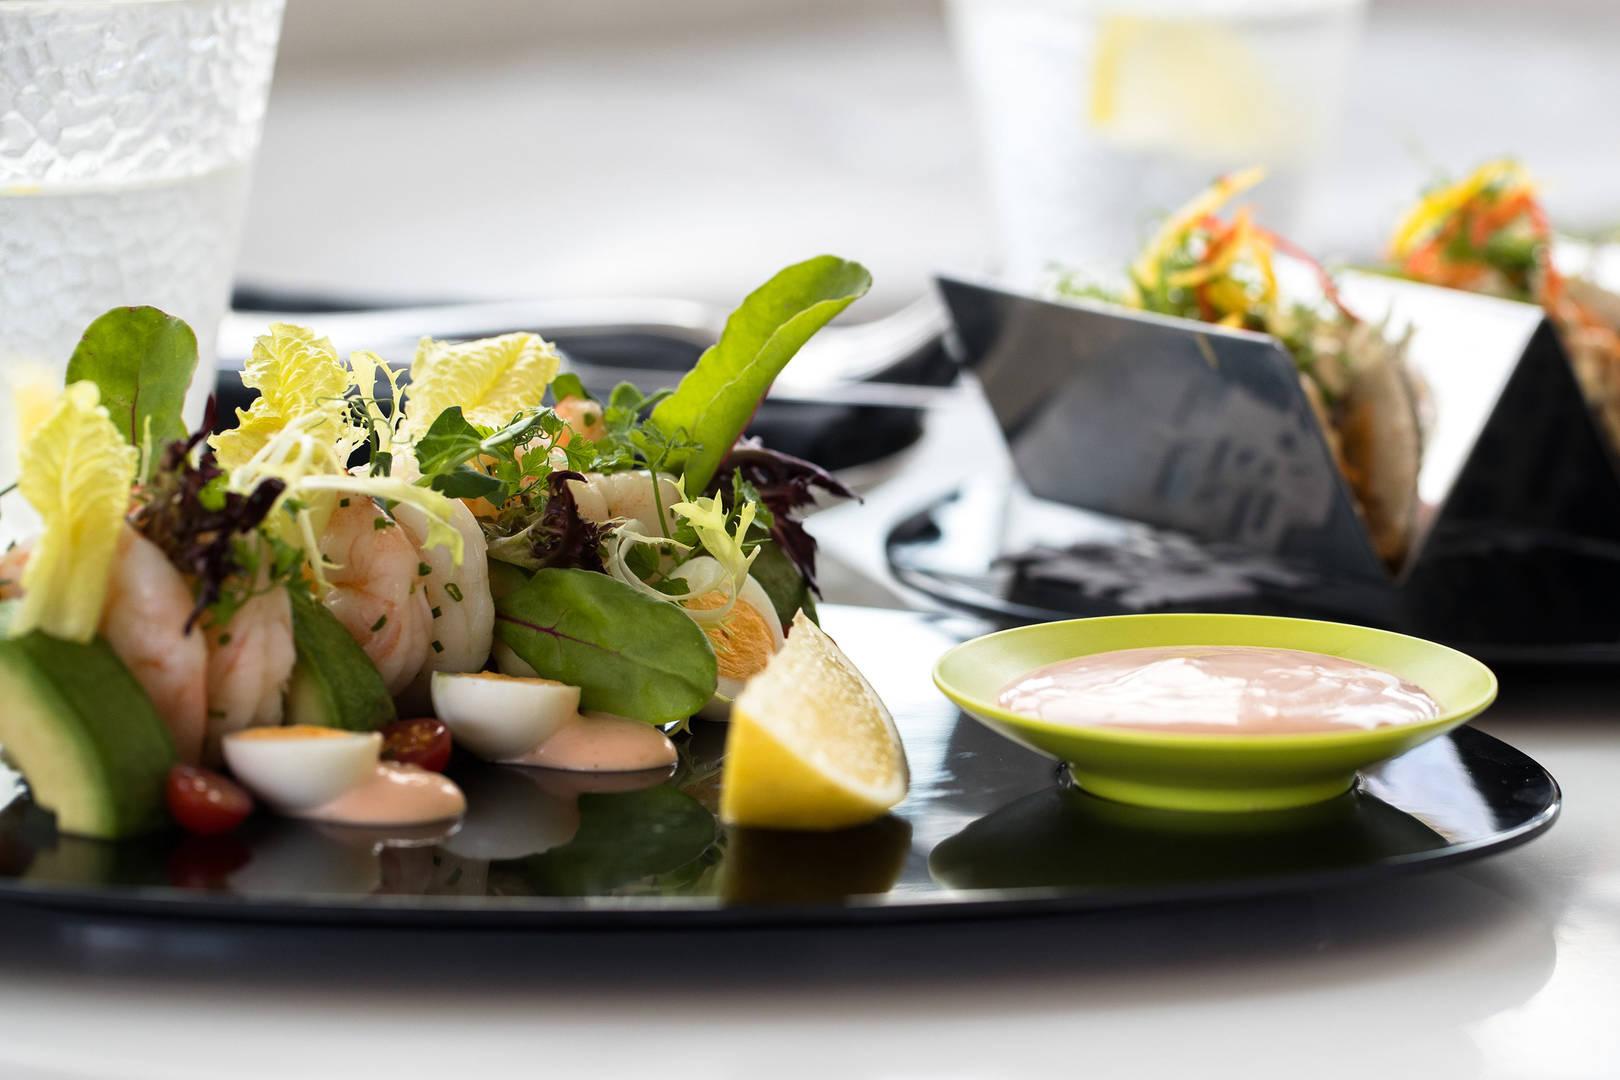 https://cdn.jumeirah.com/-/mediadh/DH/Hospitality/Jumeirah/Restaurants/Dubai/Creekside-Hotel-Cu-Ba-Bar/Hero-Banner/Jumeirah-Creekside-Hotel-Cu-Ba-Bar-Food_6-4.jpg?h=1080&w=1620&hash=2947633C1ED1E9D83C2838F7584EABEA